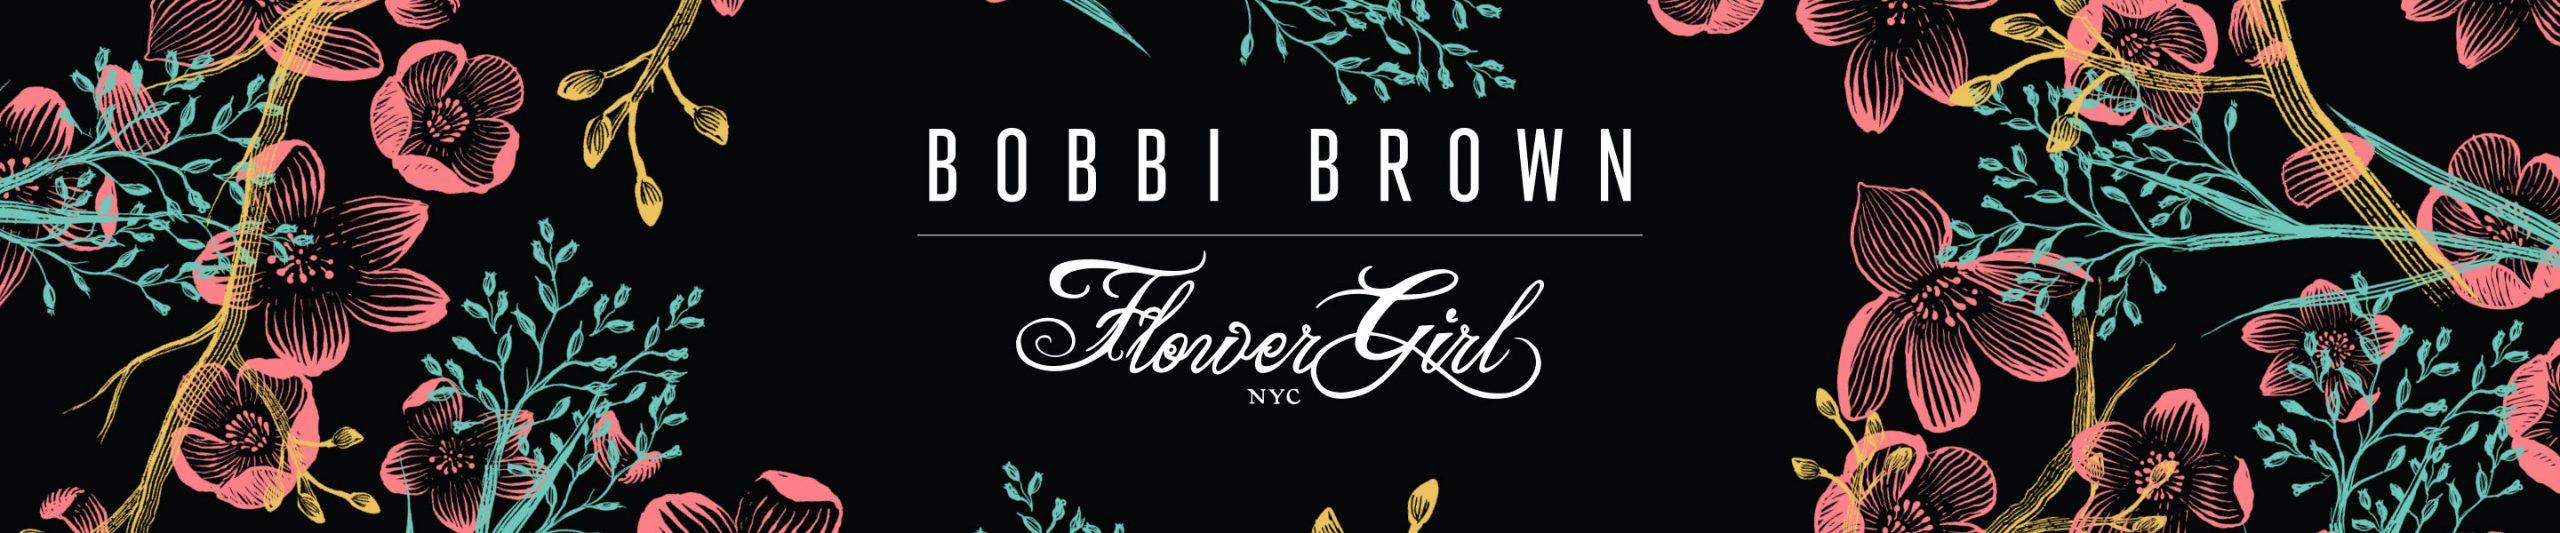 Bobbi Brown Flower Motif Collection